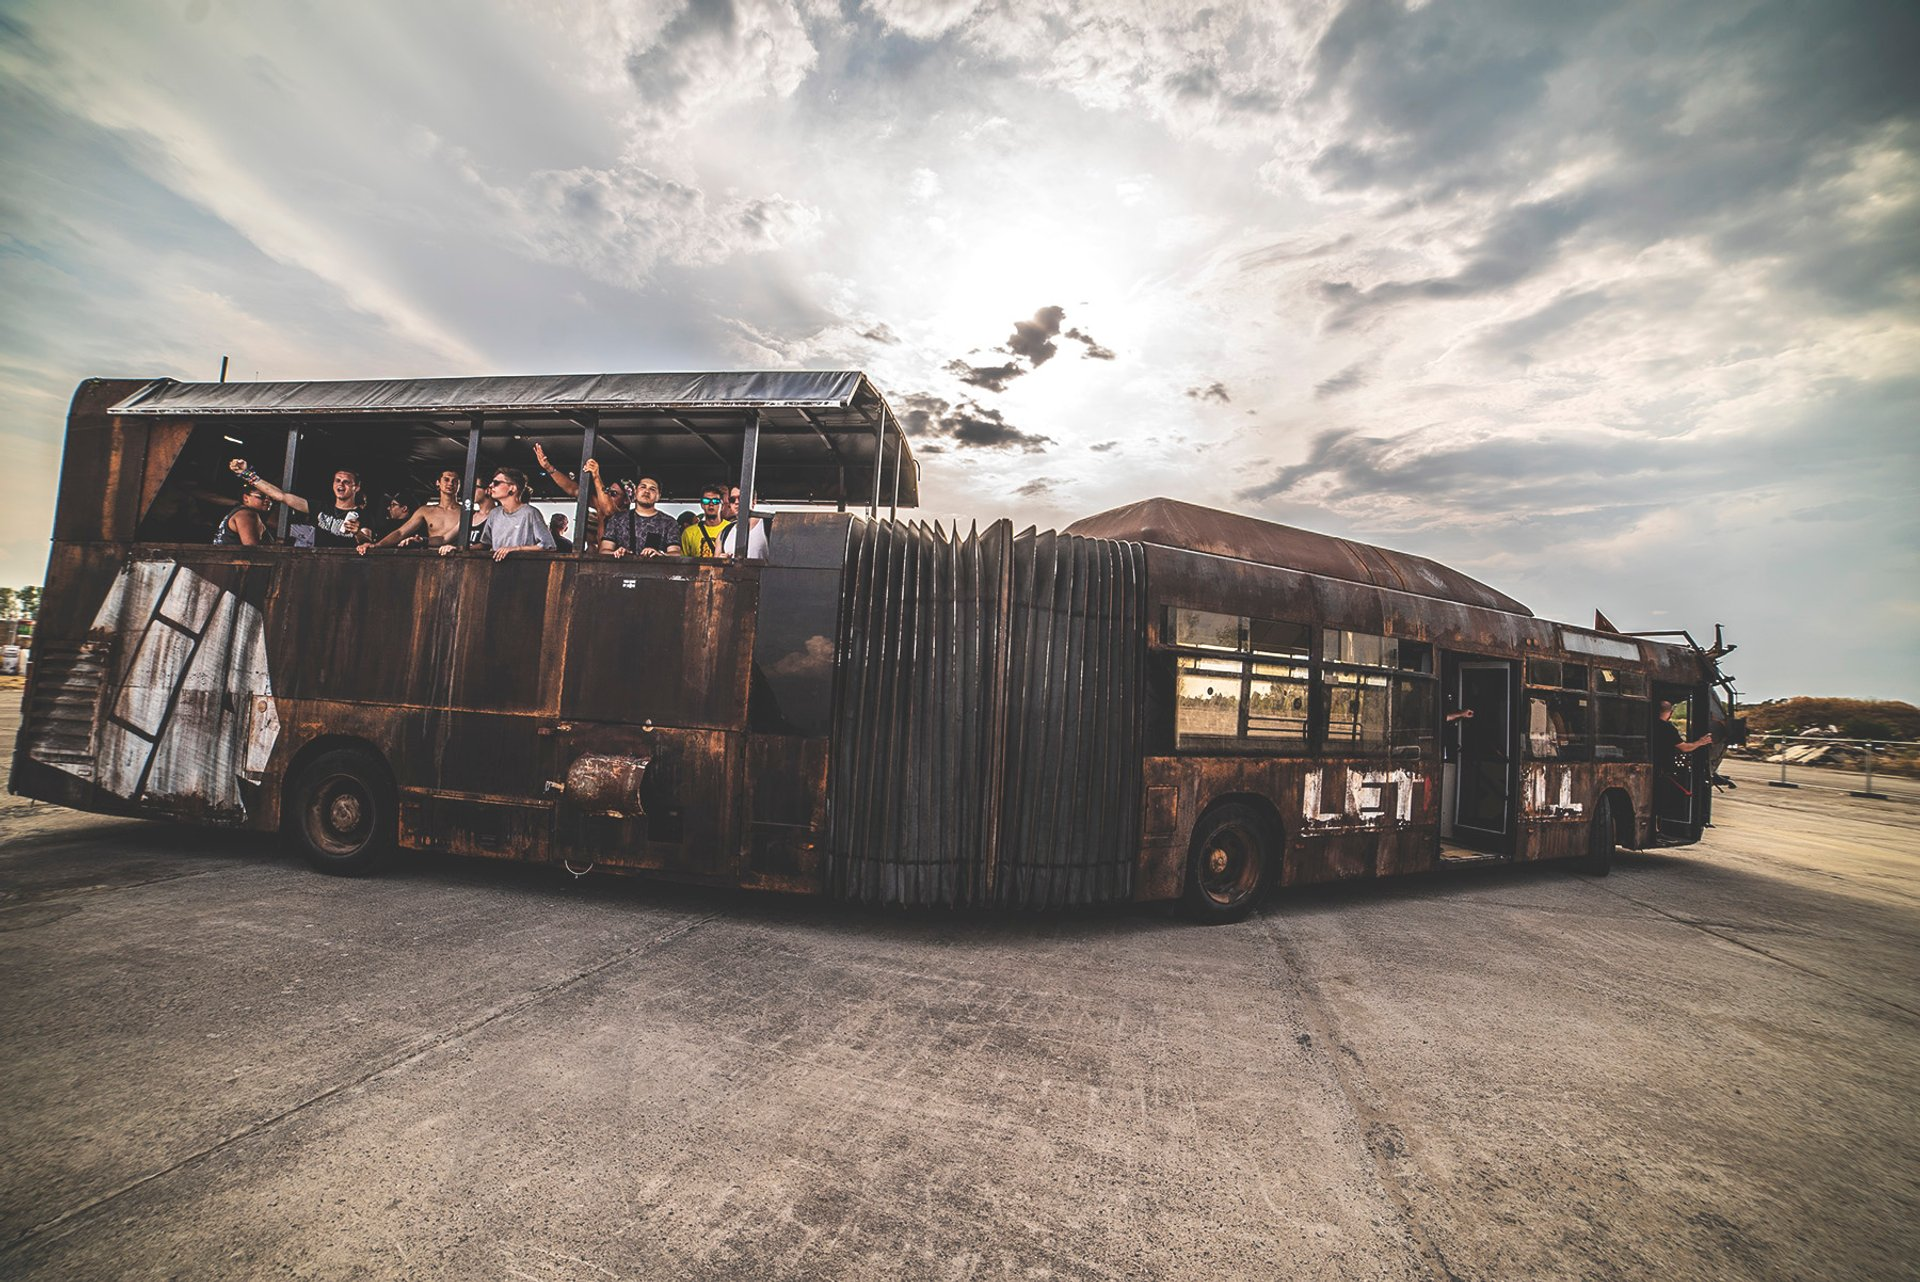 LIR2018 - Bus party 2020